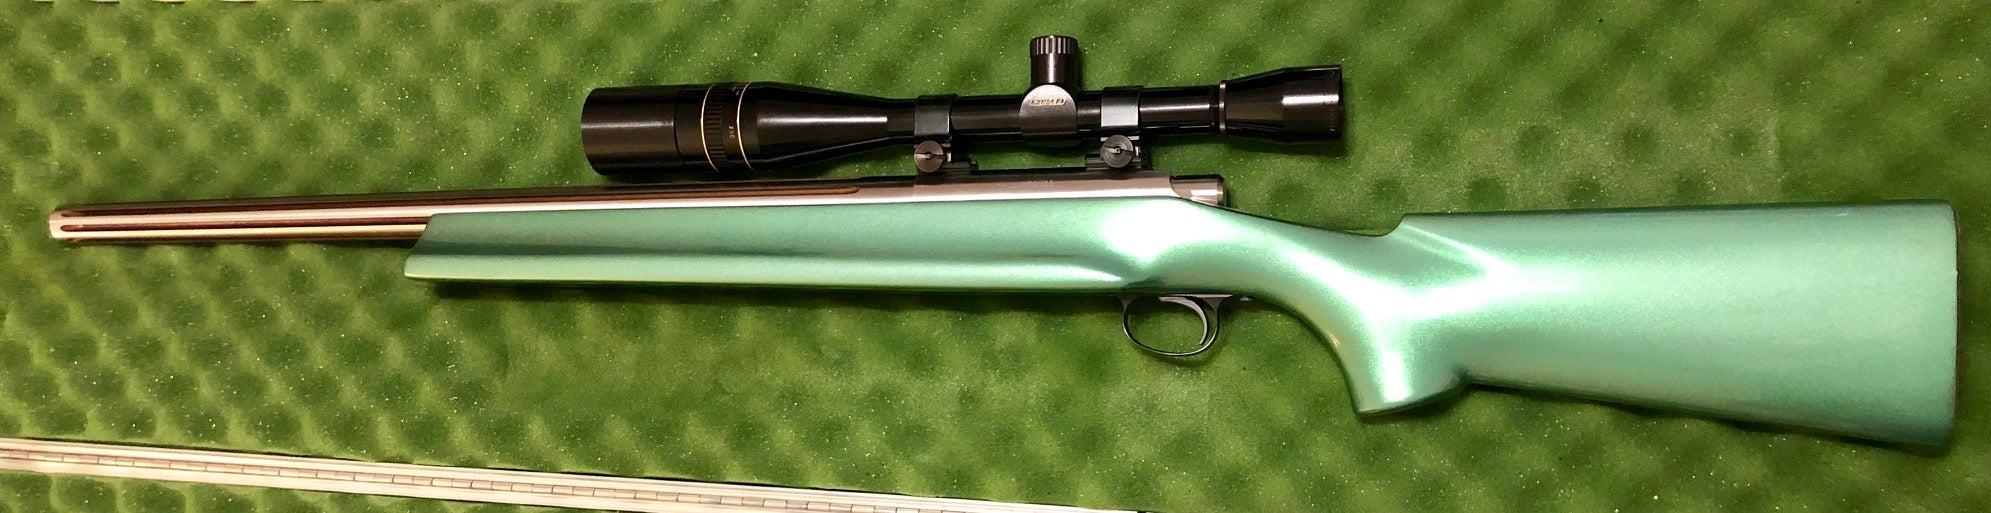 Blast From the Past: 6mm PPC Green Machine